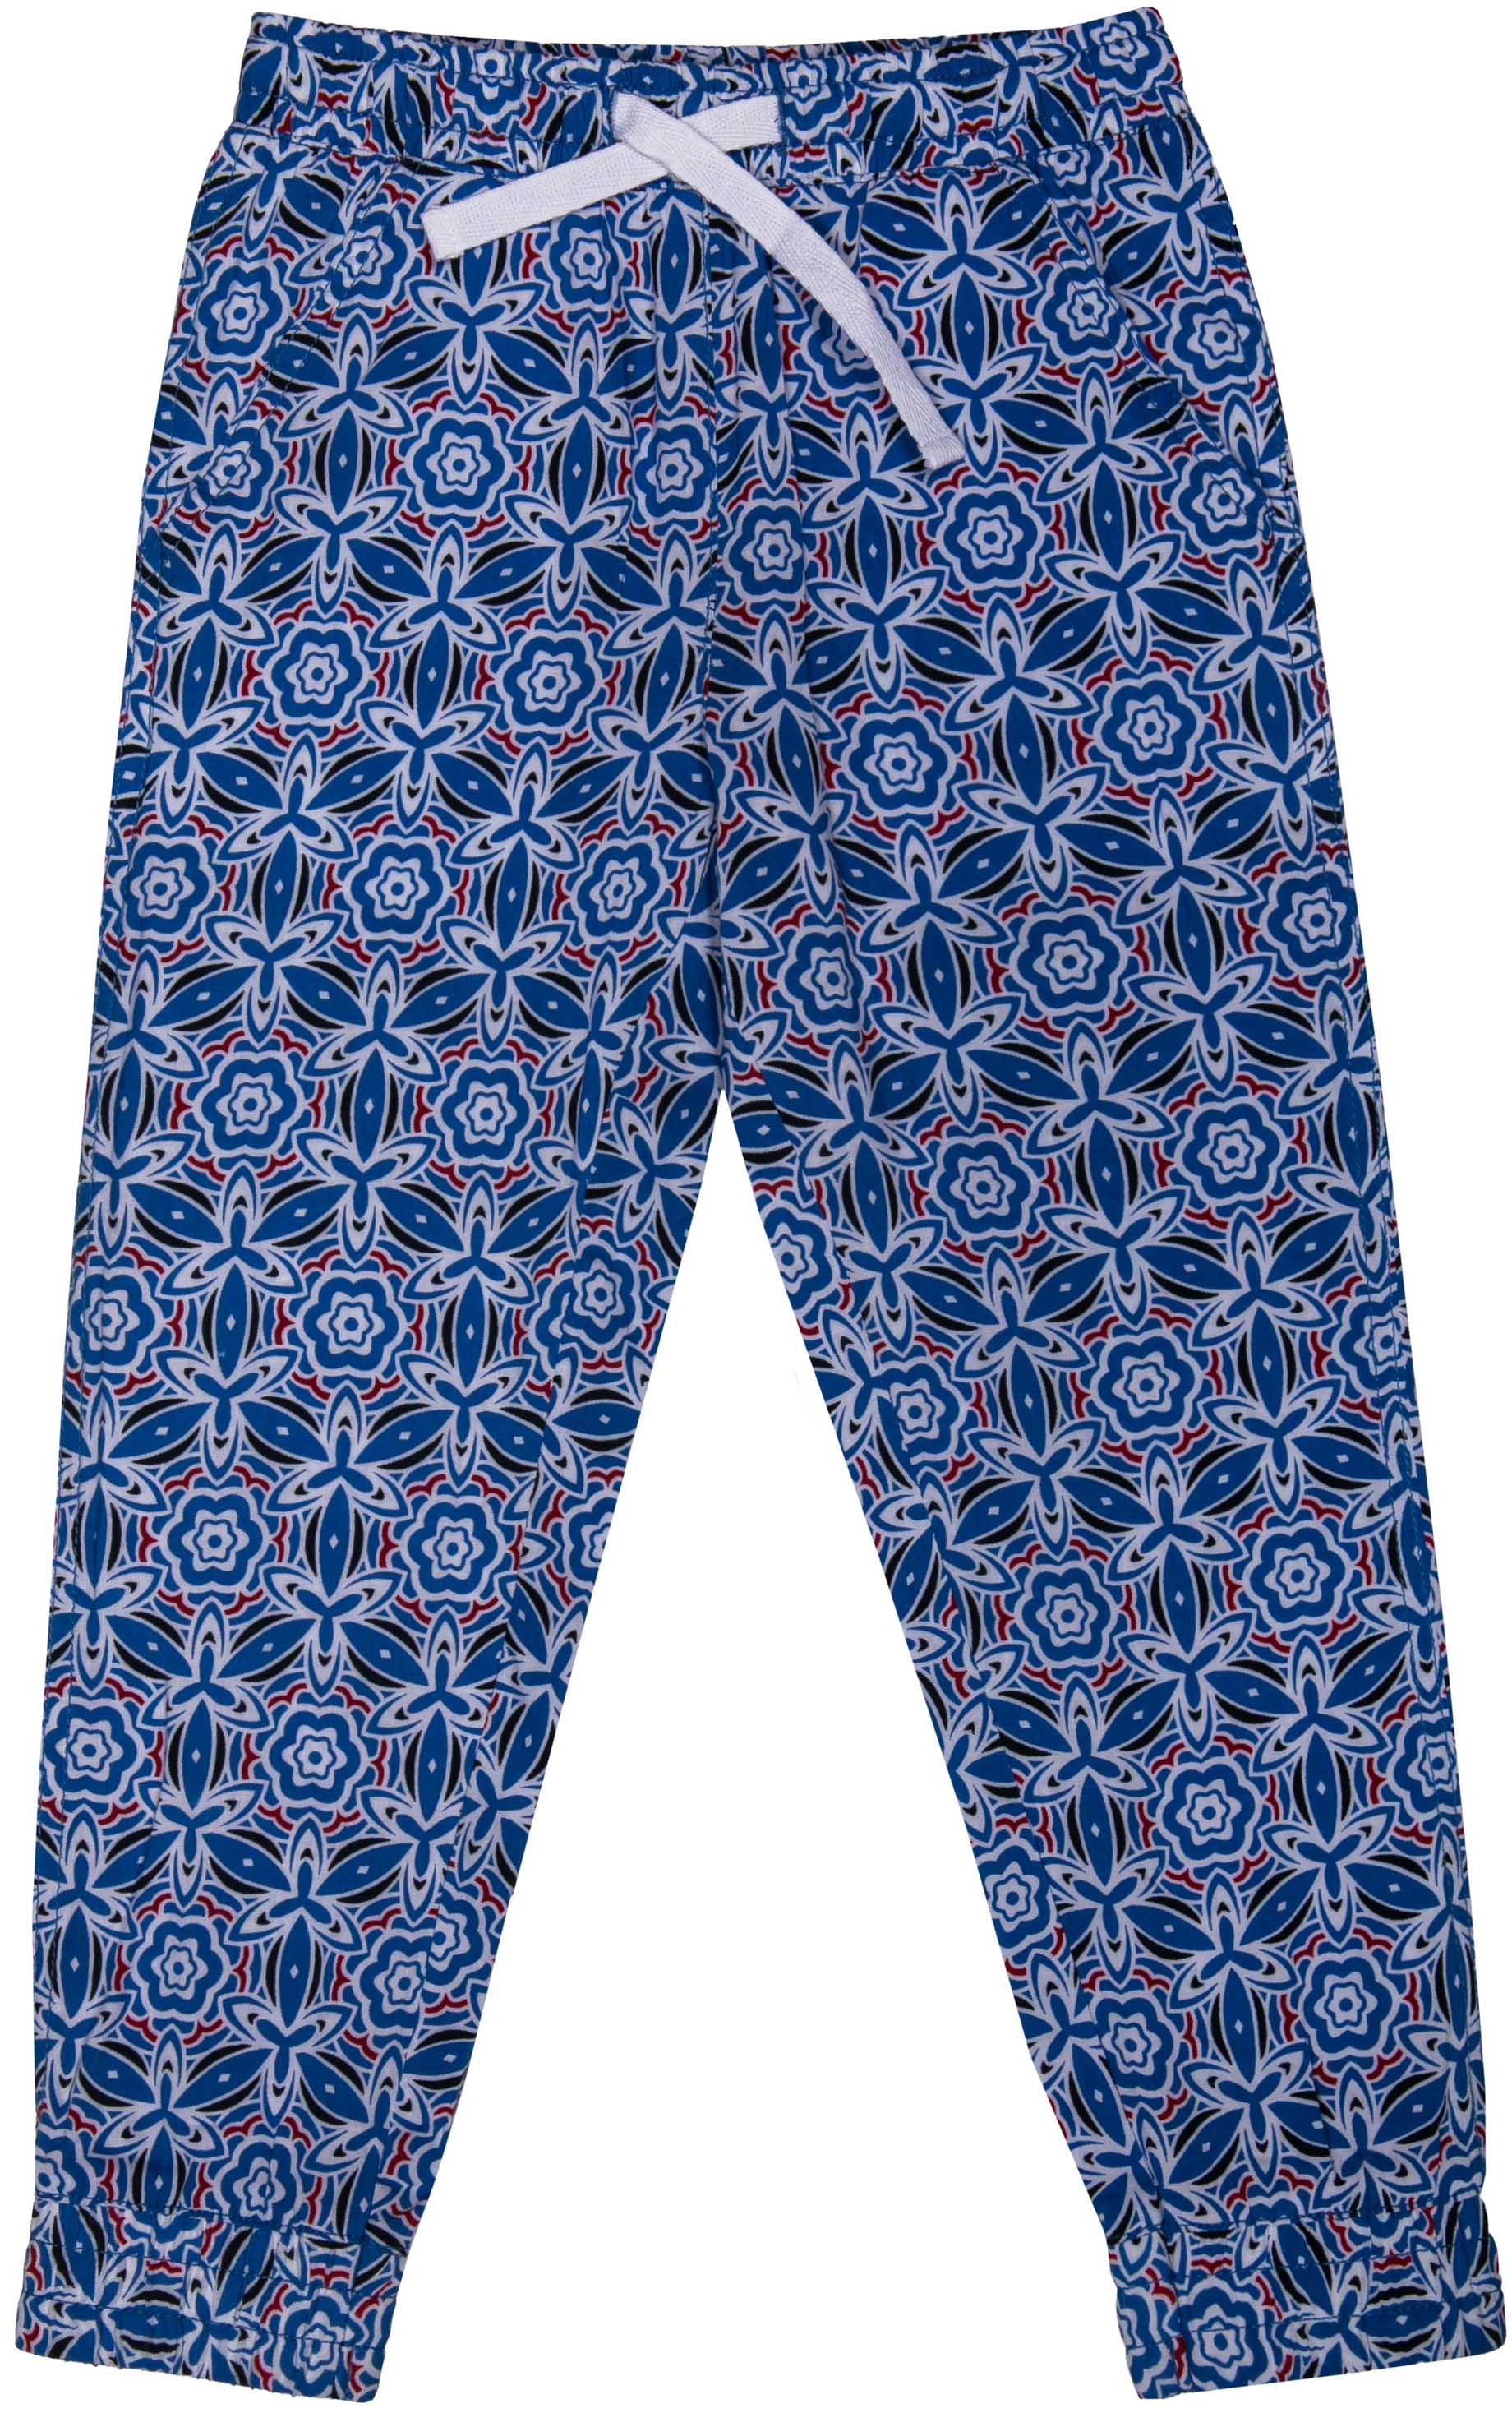 Брюки Barkito Фантазия S18G3014W(1) брюки для девочки barkito фантазия голубые с рисунком